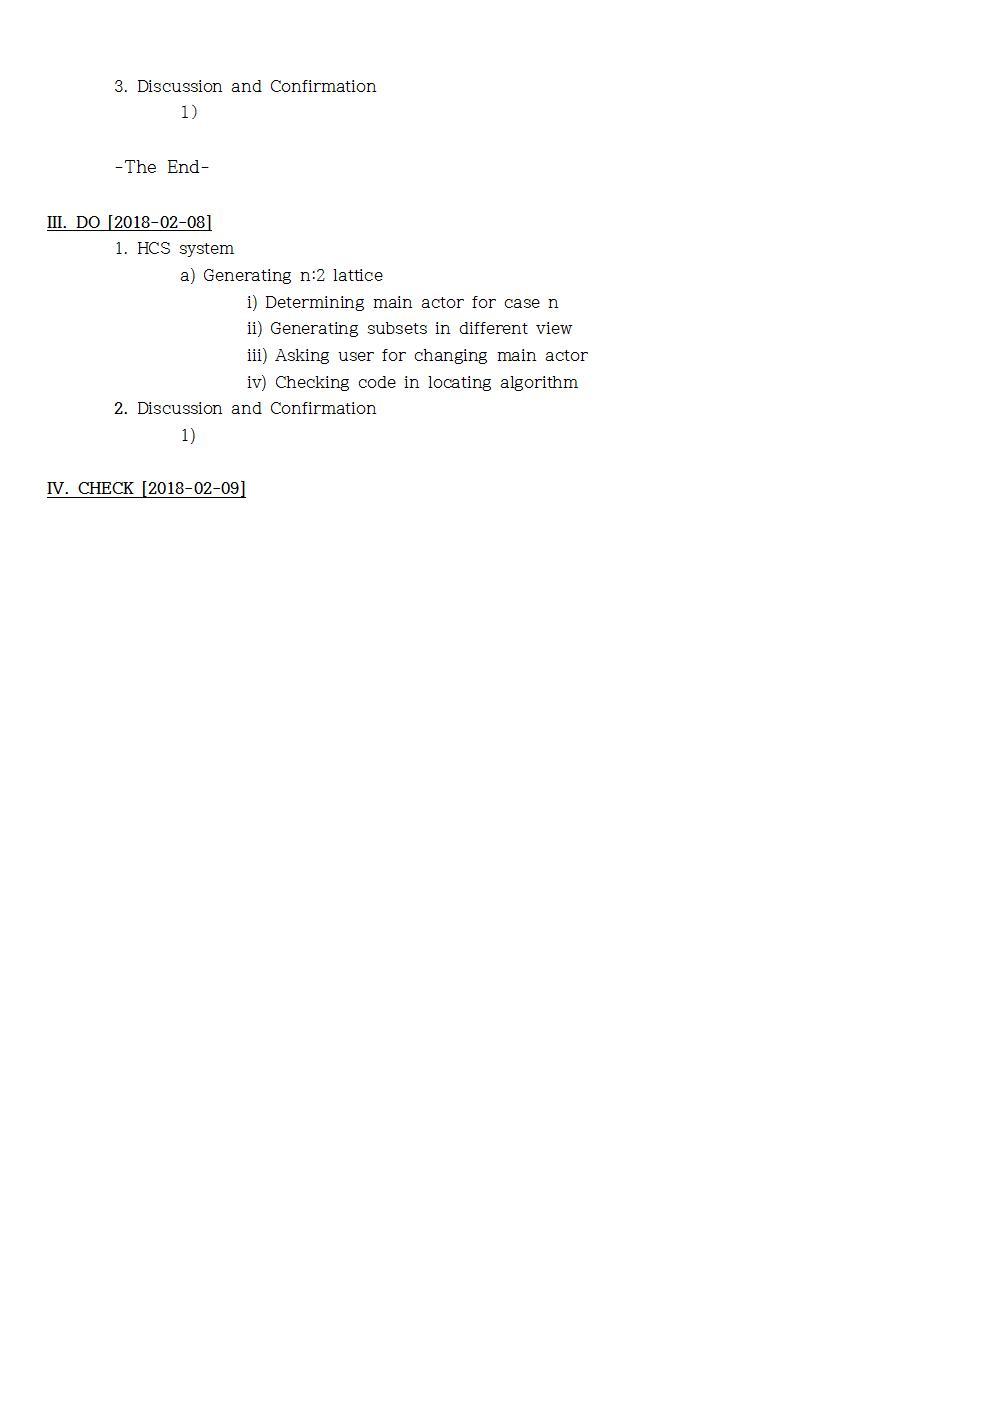 D-[18-002-RD-02]-[PRISM2.0-ADOxx]-[2018-02-08]-[MR]002.jpg